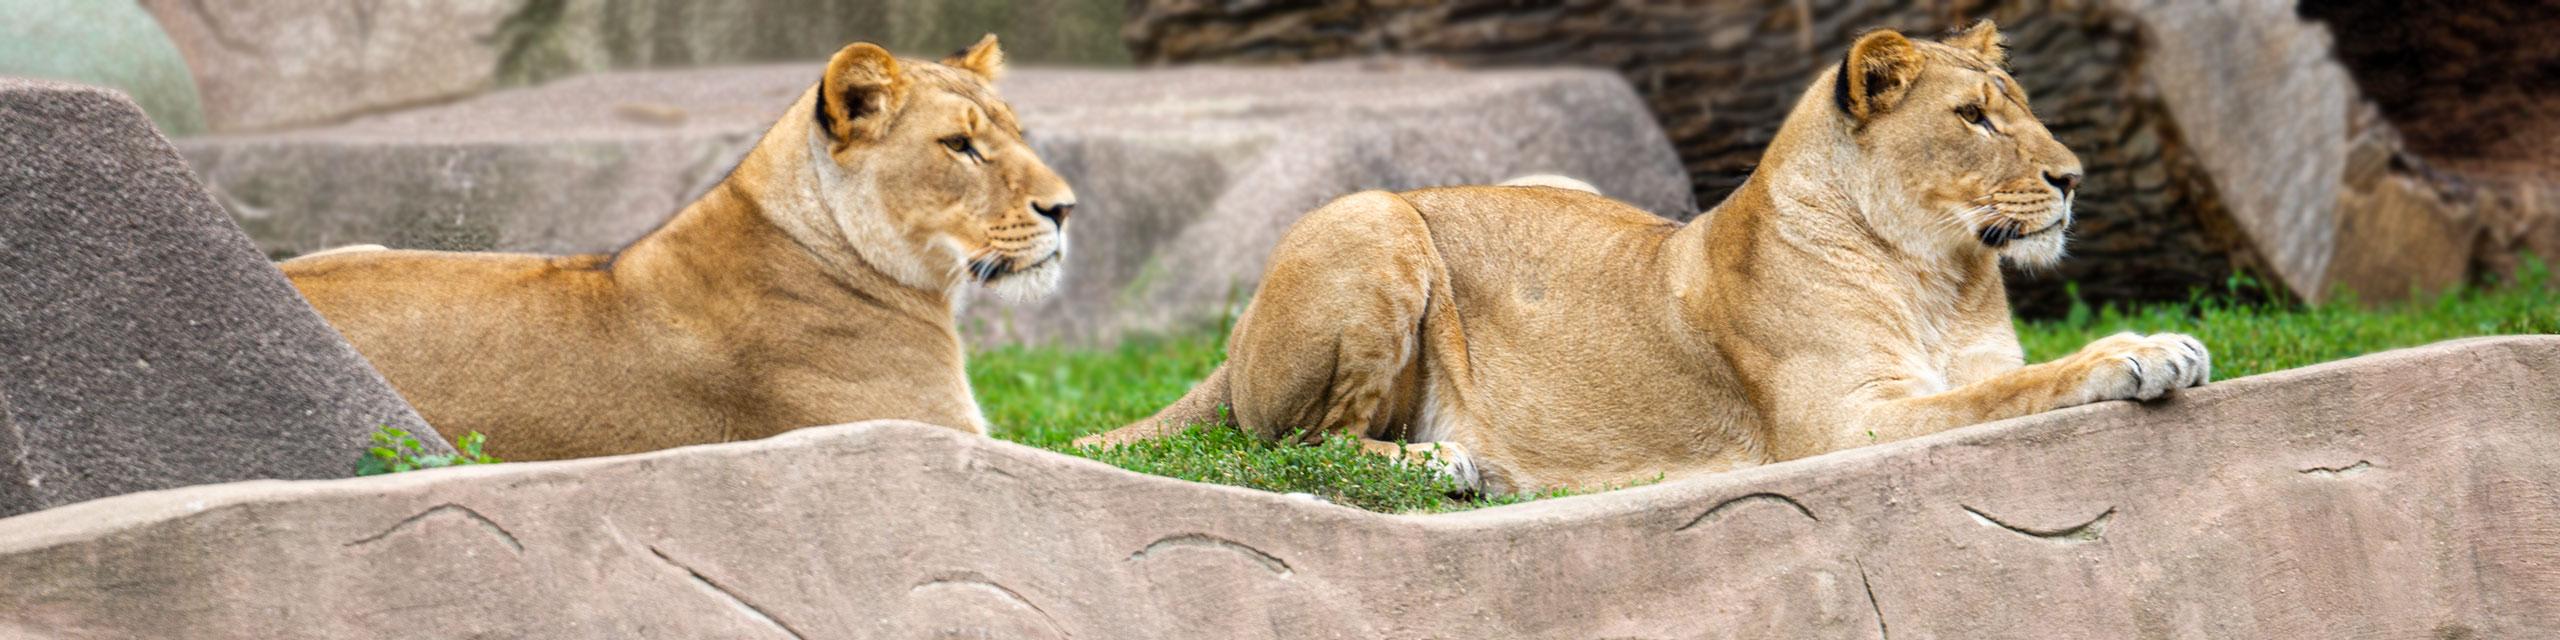 Contact Photo - Lions